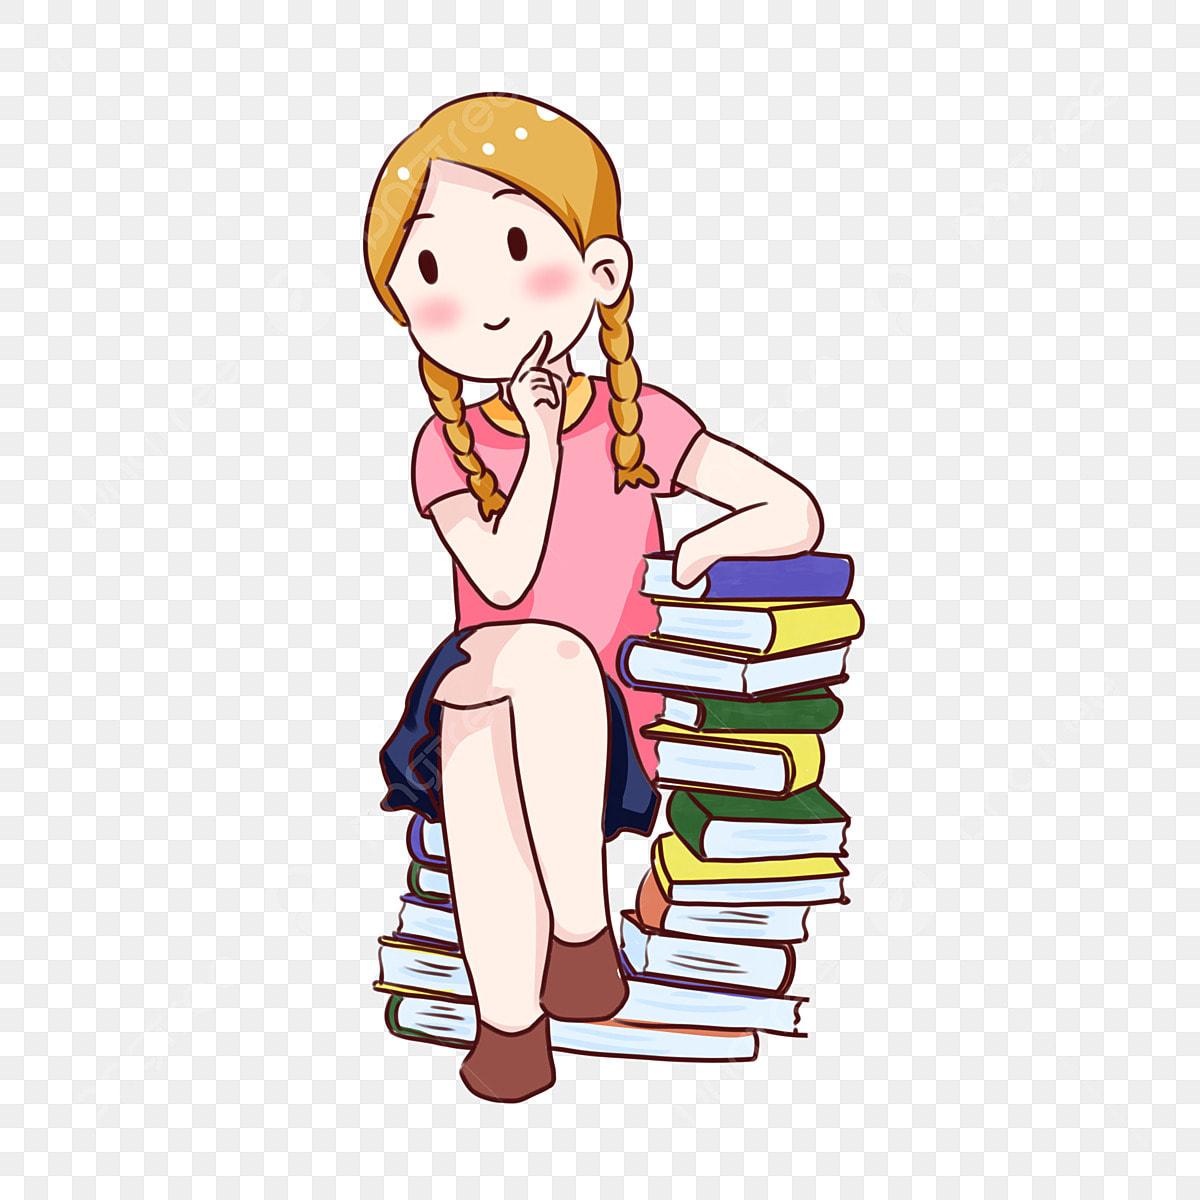 Eleve De Jour Decole Dessin Anime Dessine A La Main Livre La